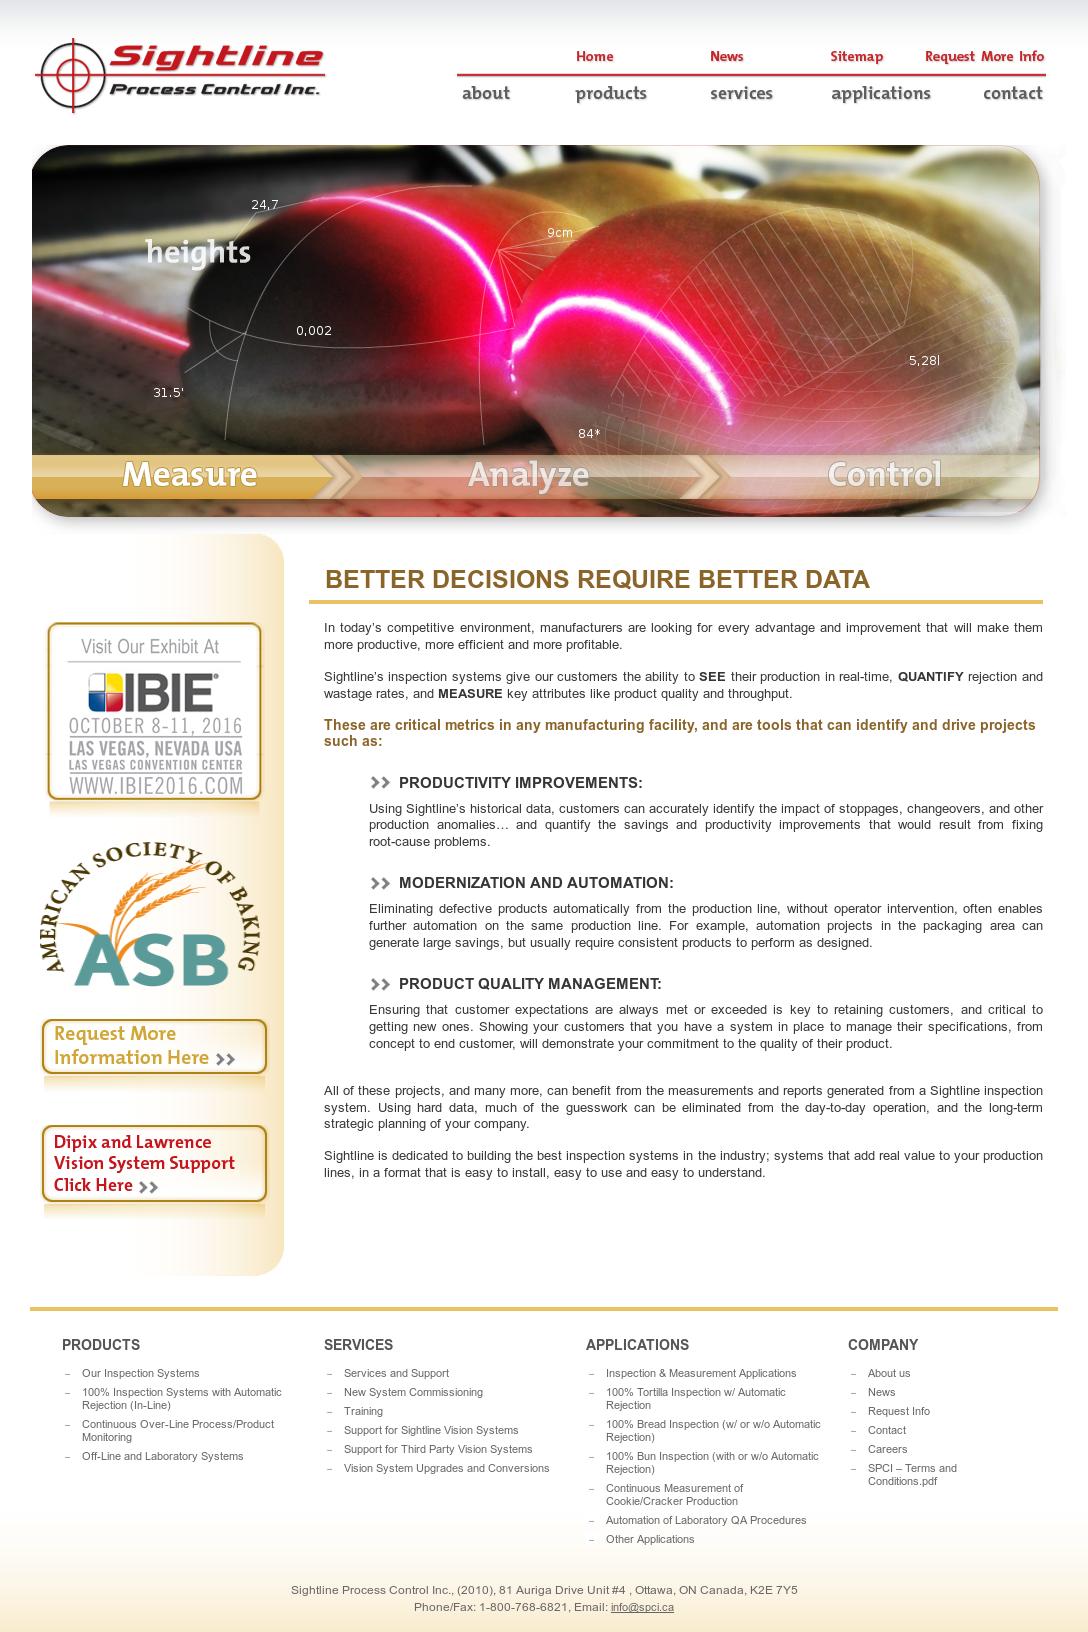 Spci Competitors, Revenue and Employees - Owler Company Profile